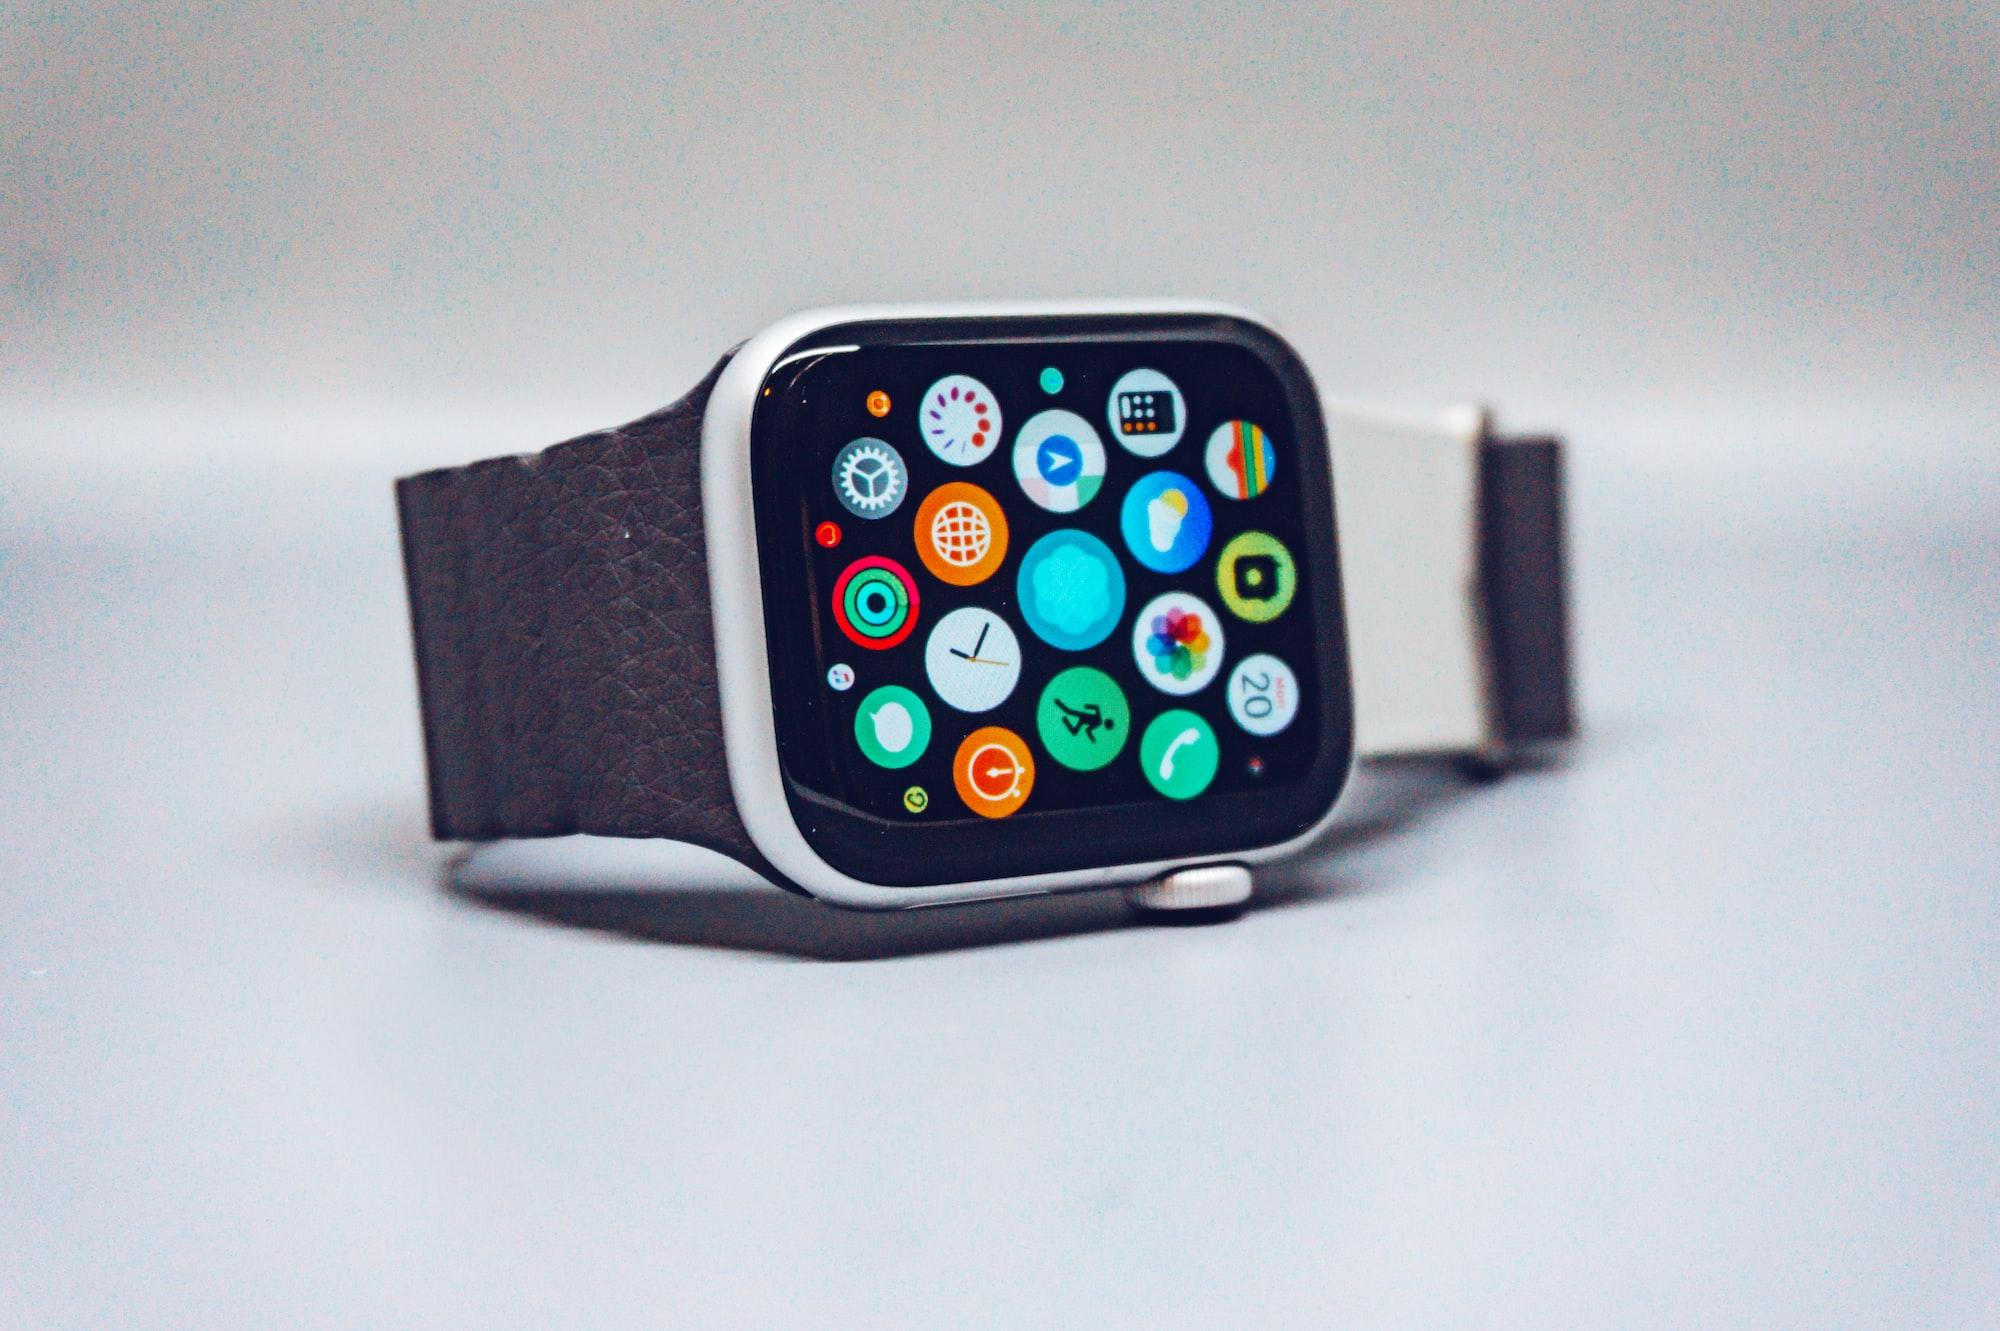 Is This Sleep Tracking App Idea Realistic?